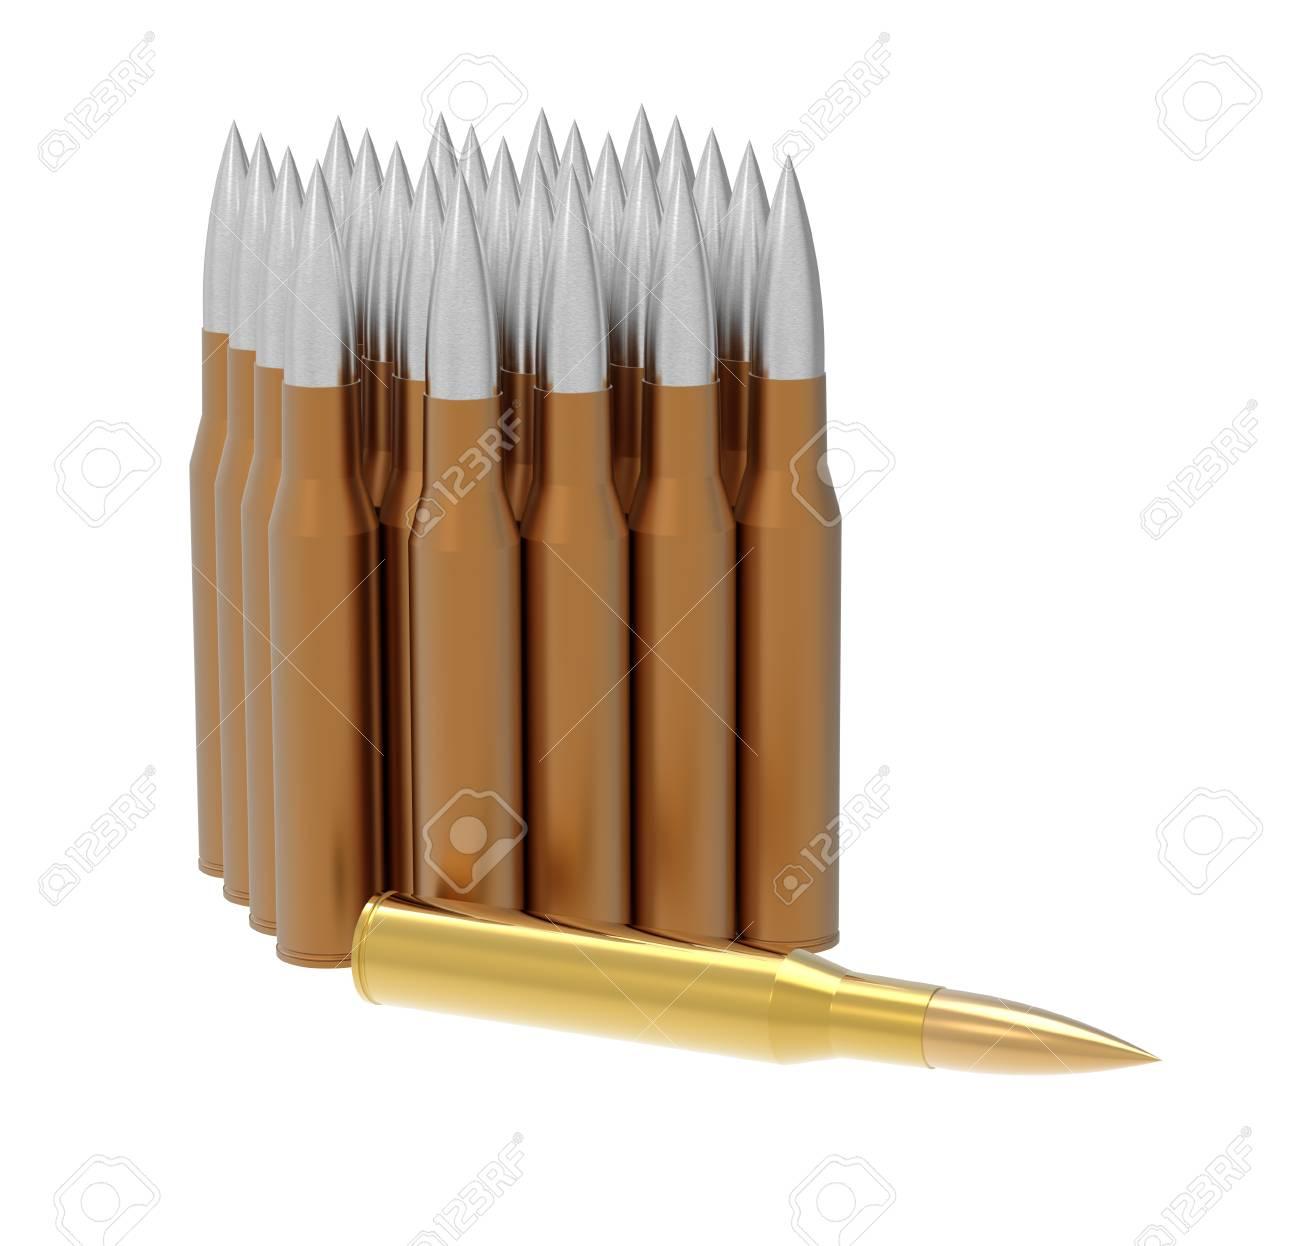 Golden bullet isolated on white background 3d render Stock Photo - 16194443